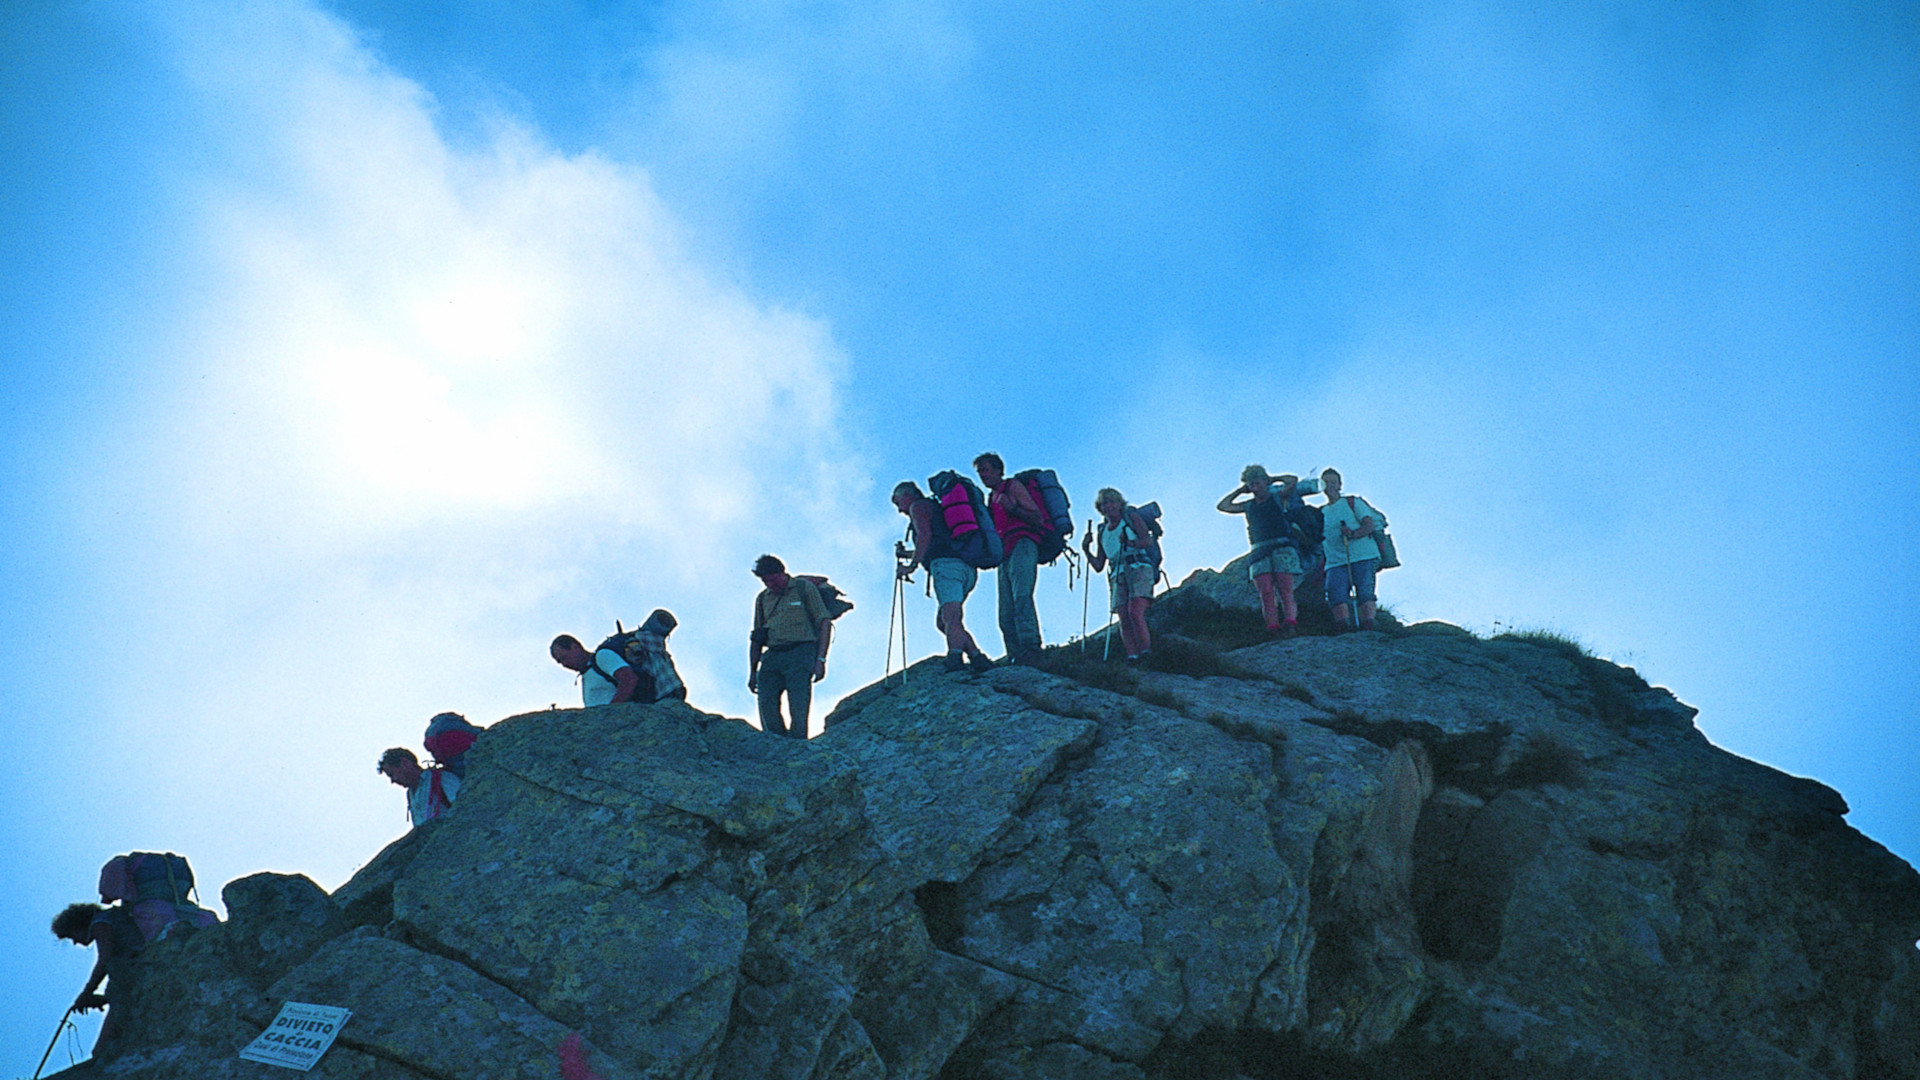 Alta Via Canavesana un trekking di 12 tappe in sentieri di